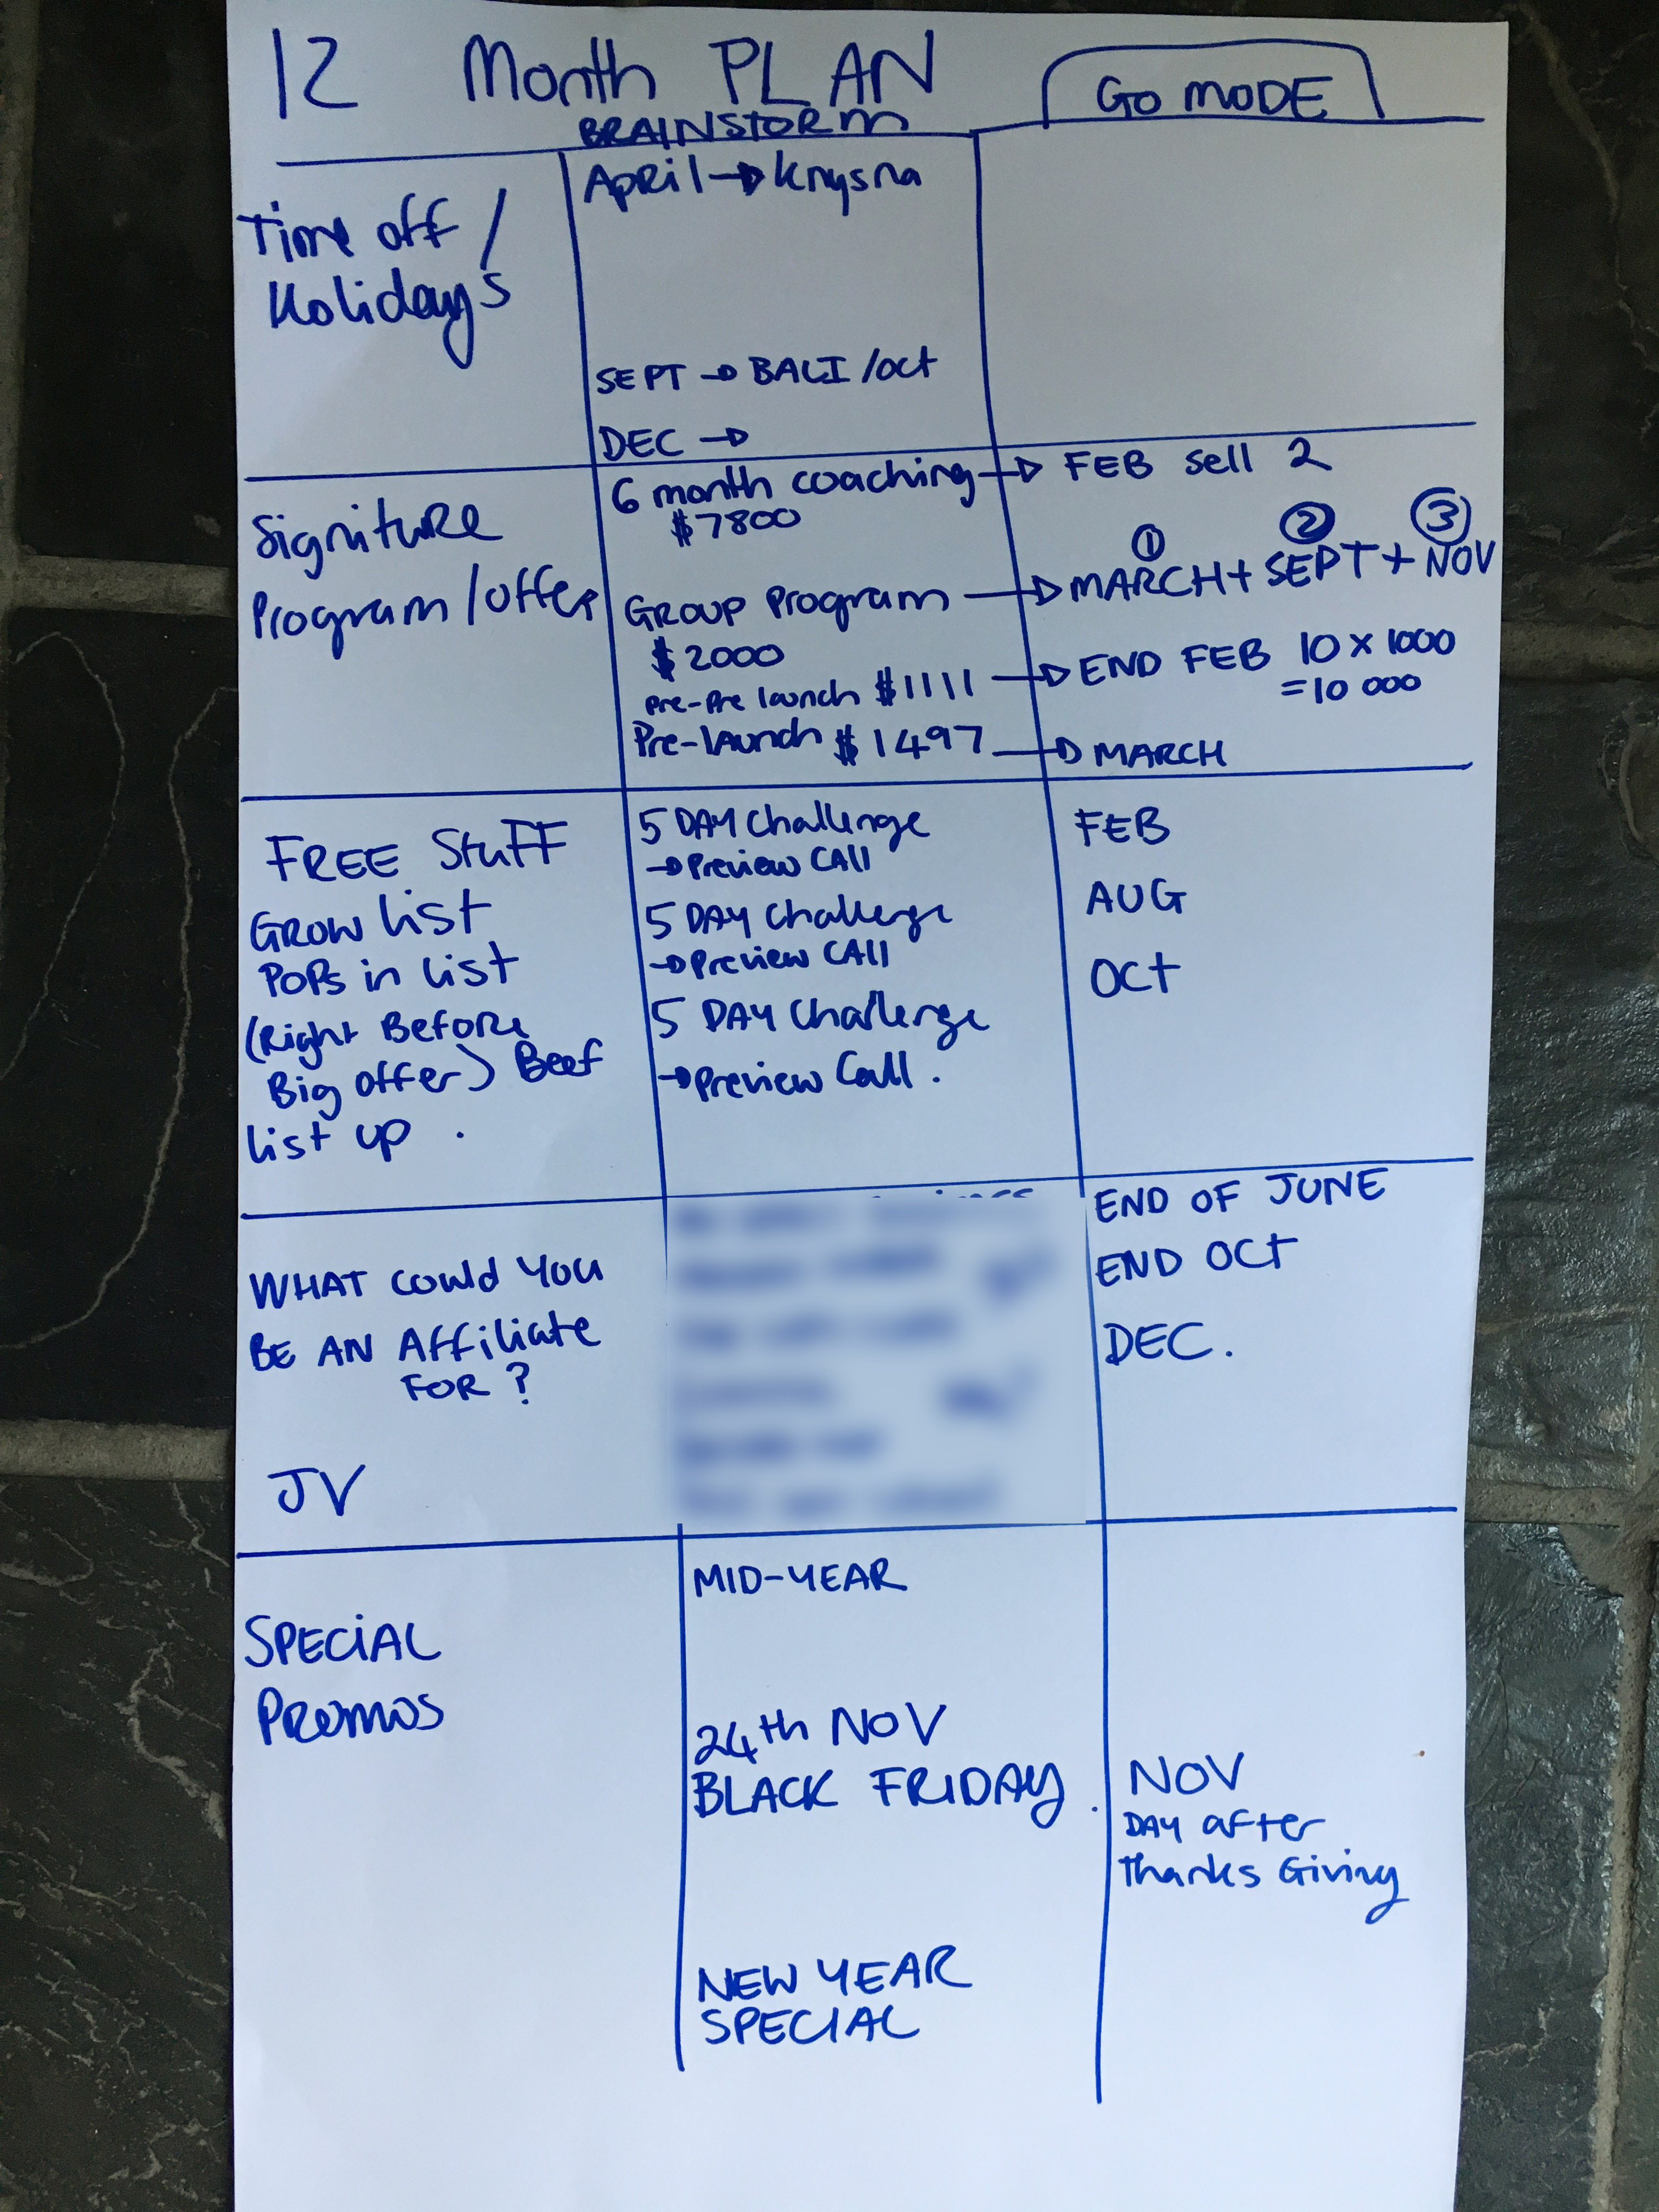 12-month-brainstorm